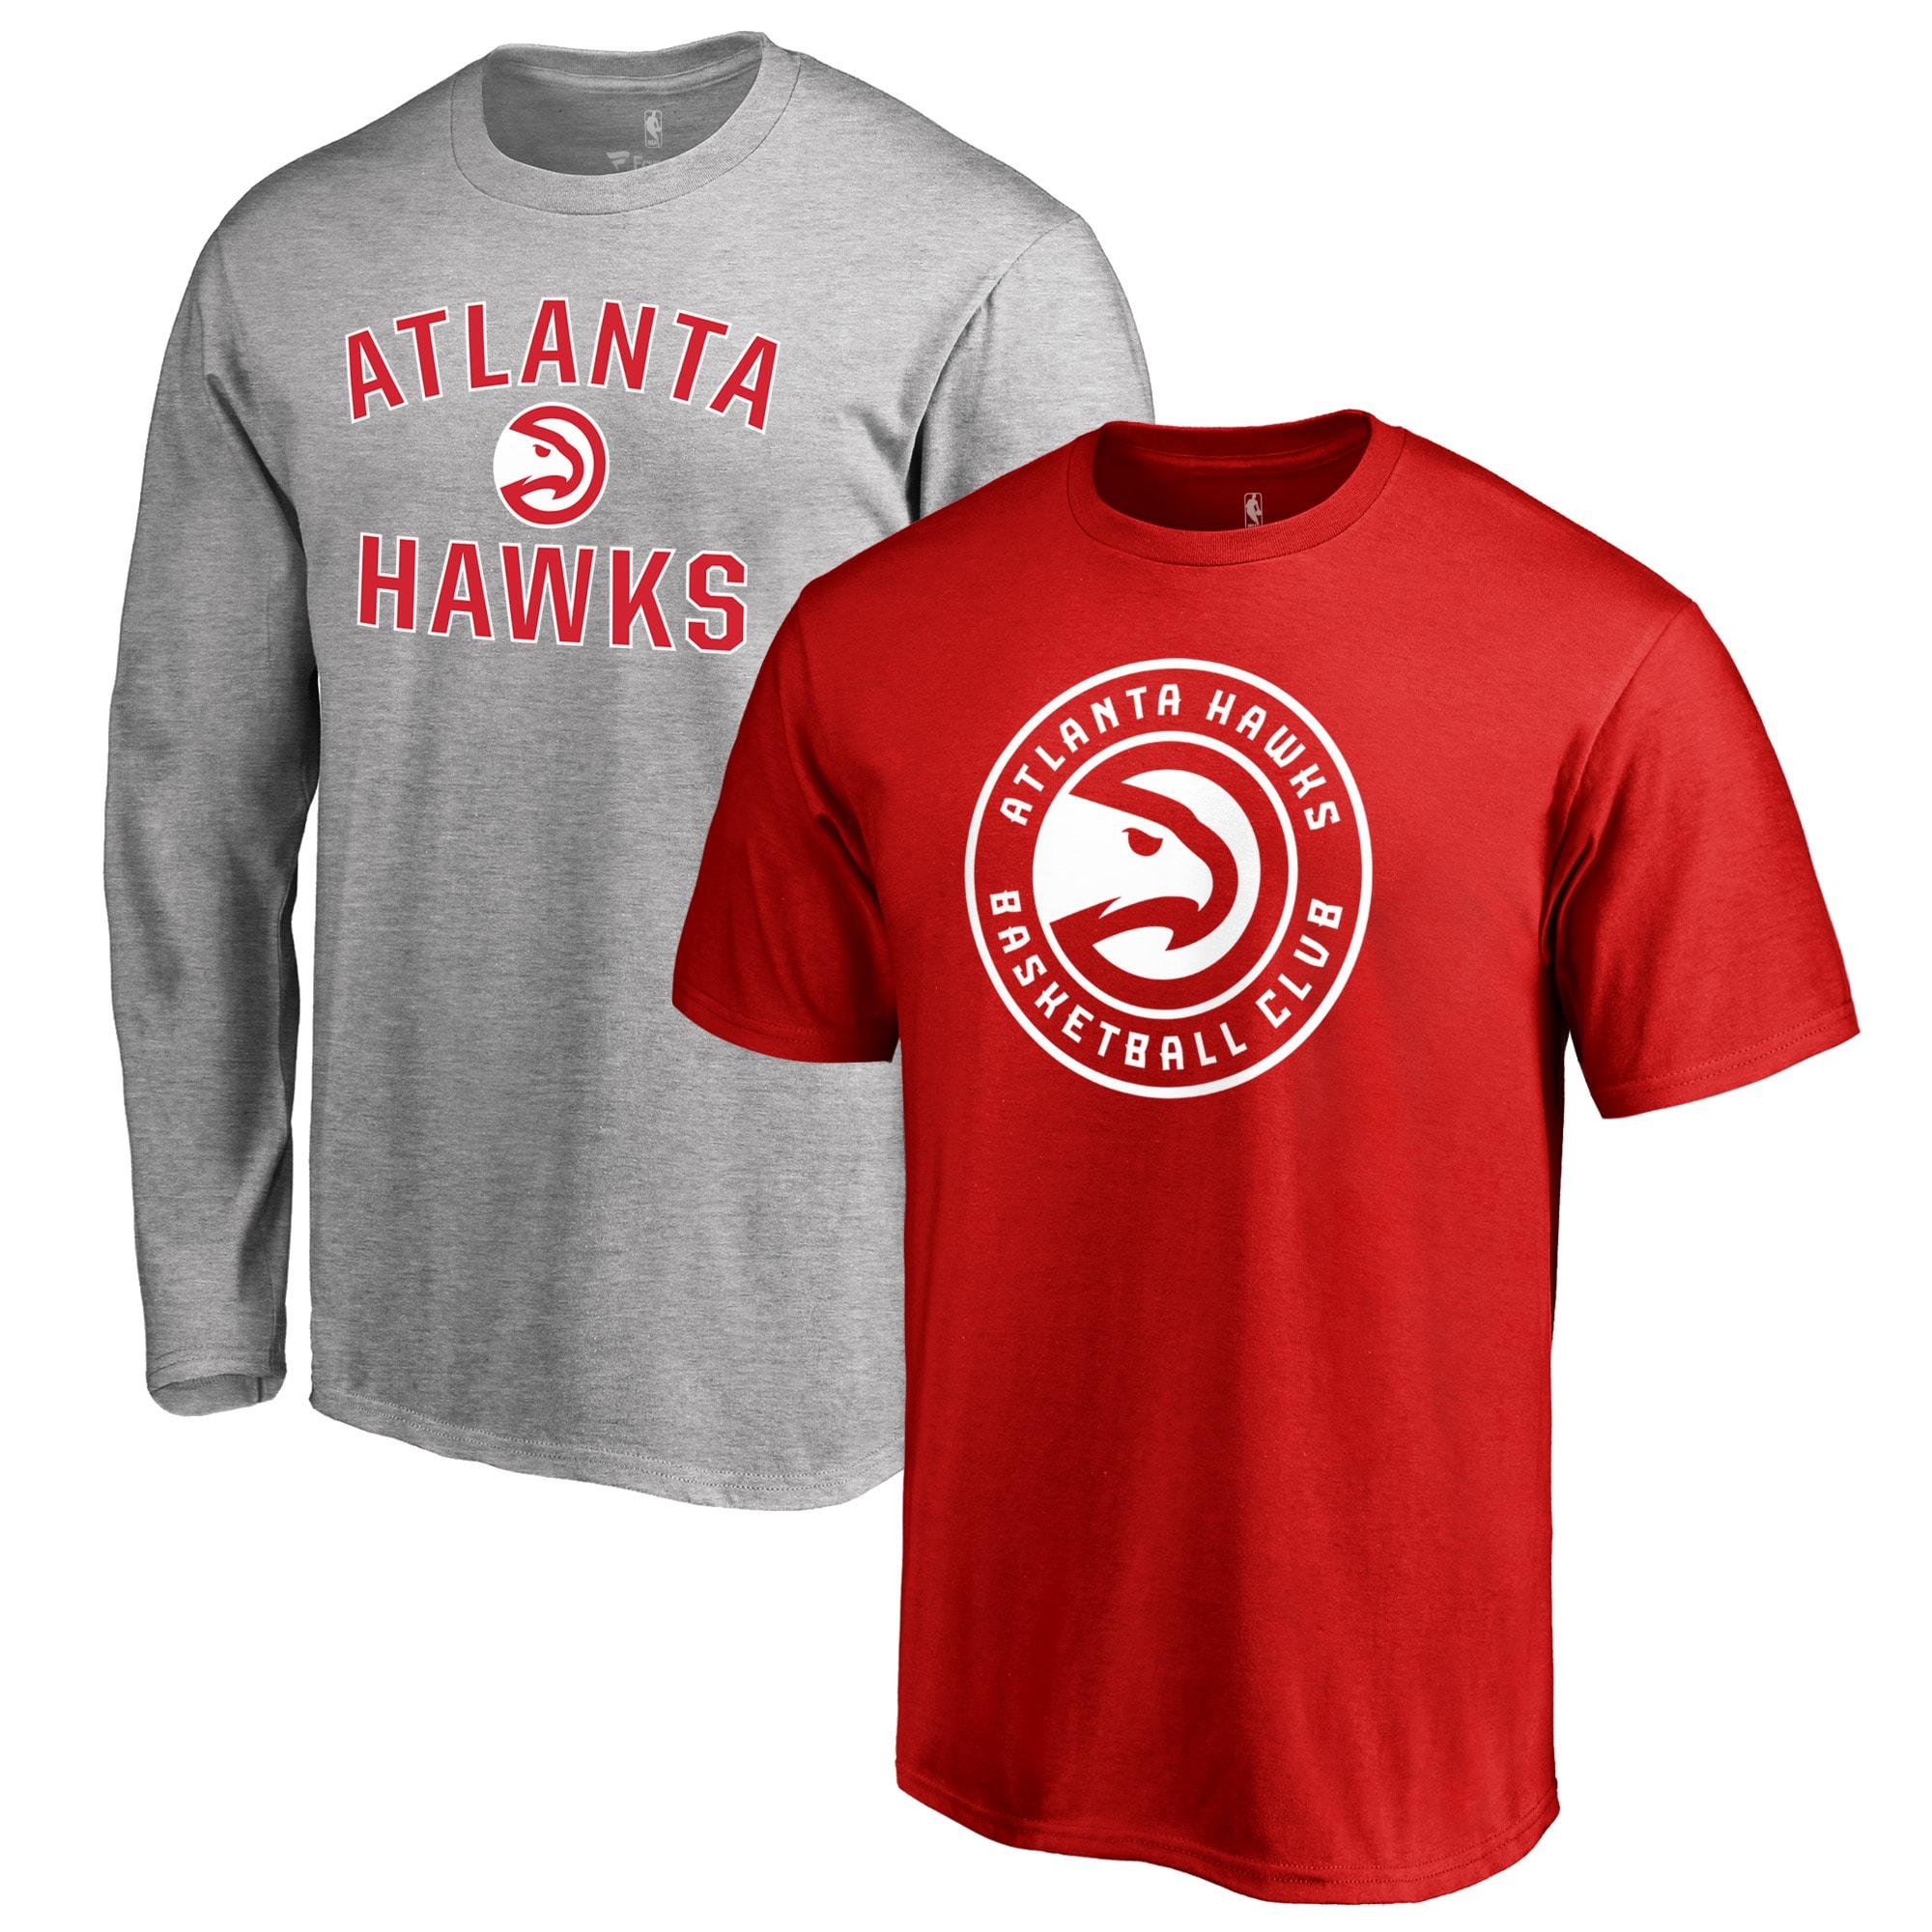 Atlanta Hawks Fanatics Branded Big & Tall T-Shirt Combo Set - Red/Heathered Gray